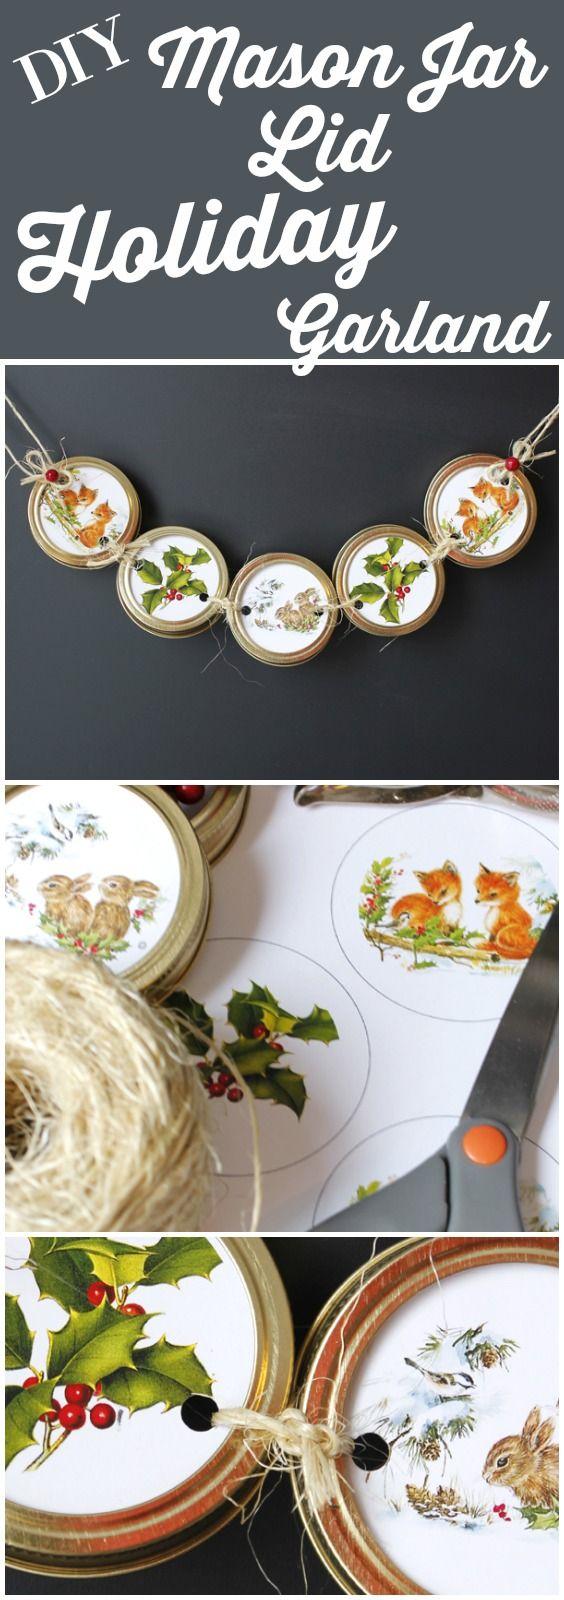 DIY Mason Jar Lid Holiday Garland - The Graphics Fairy